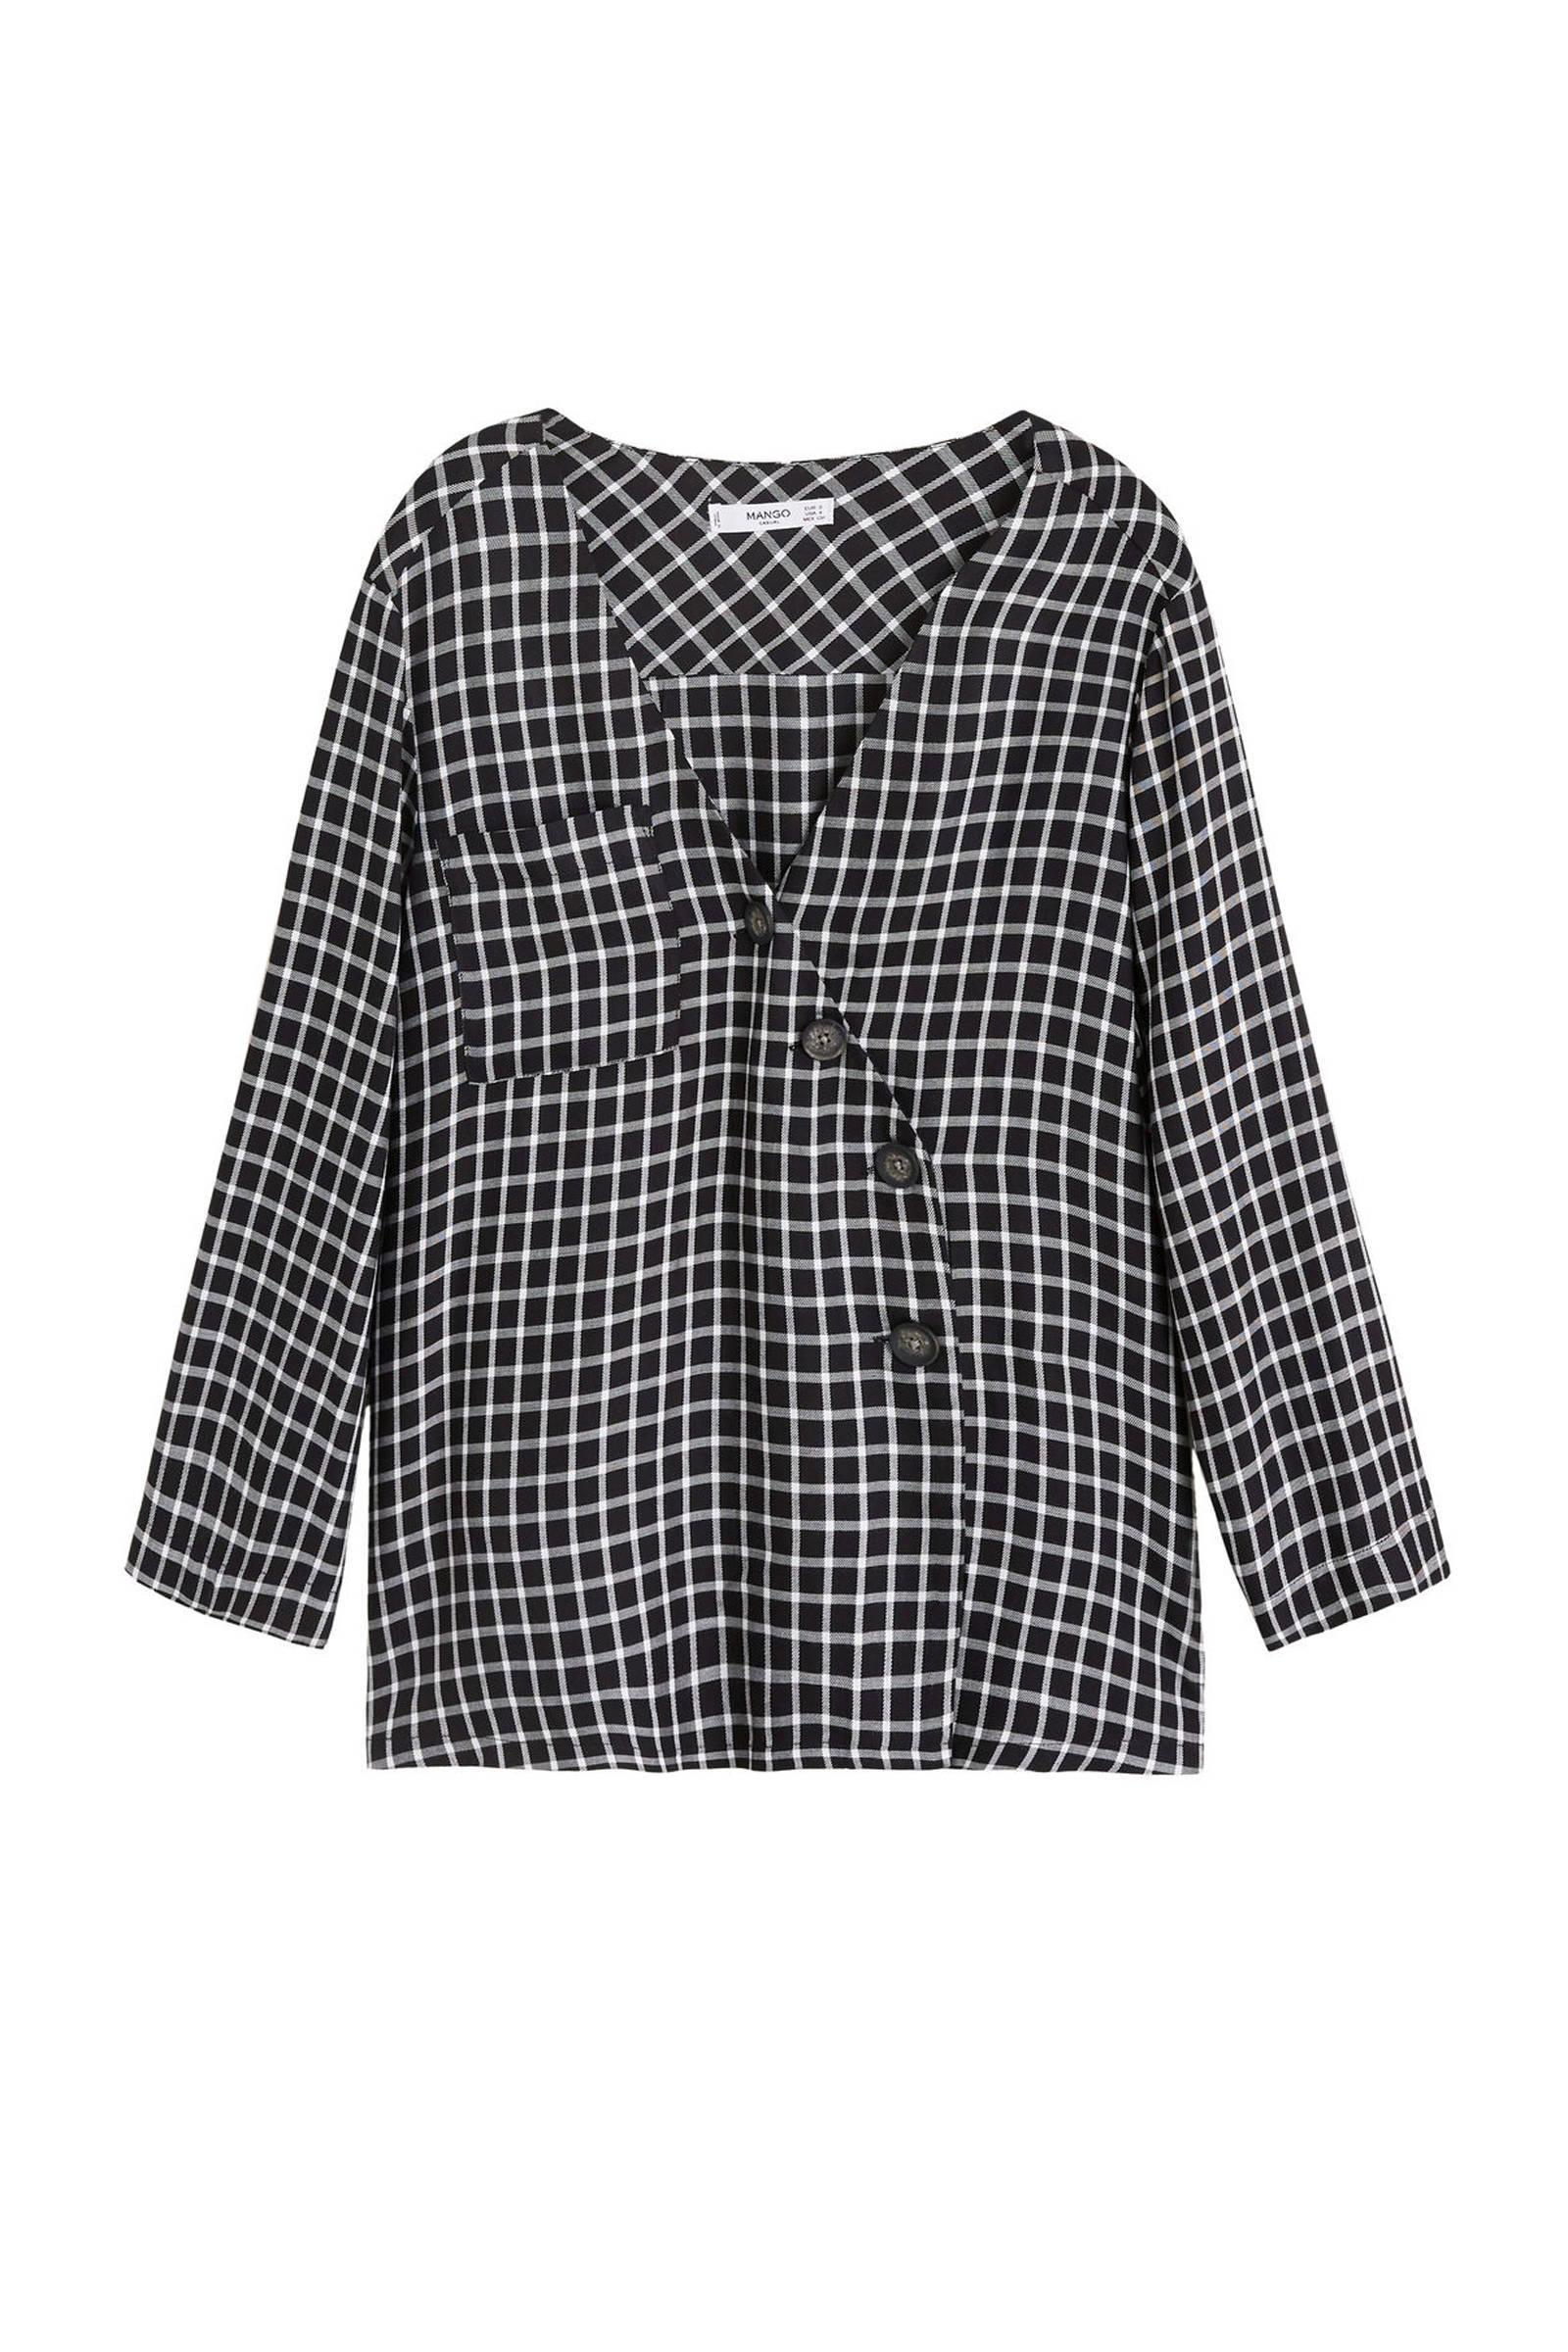 mango blouse zwart